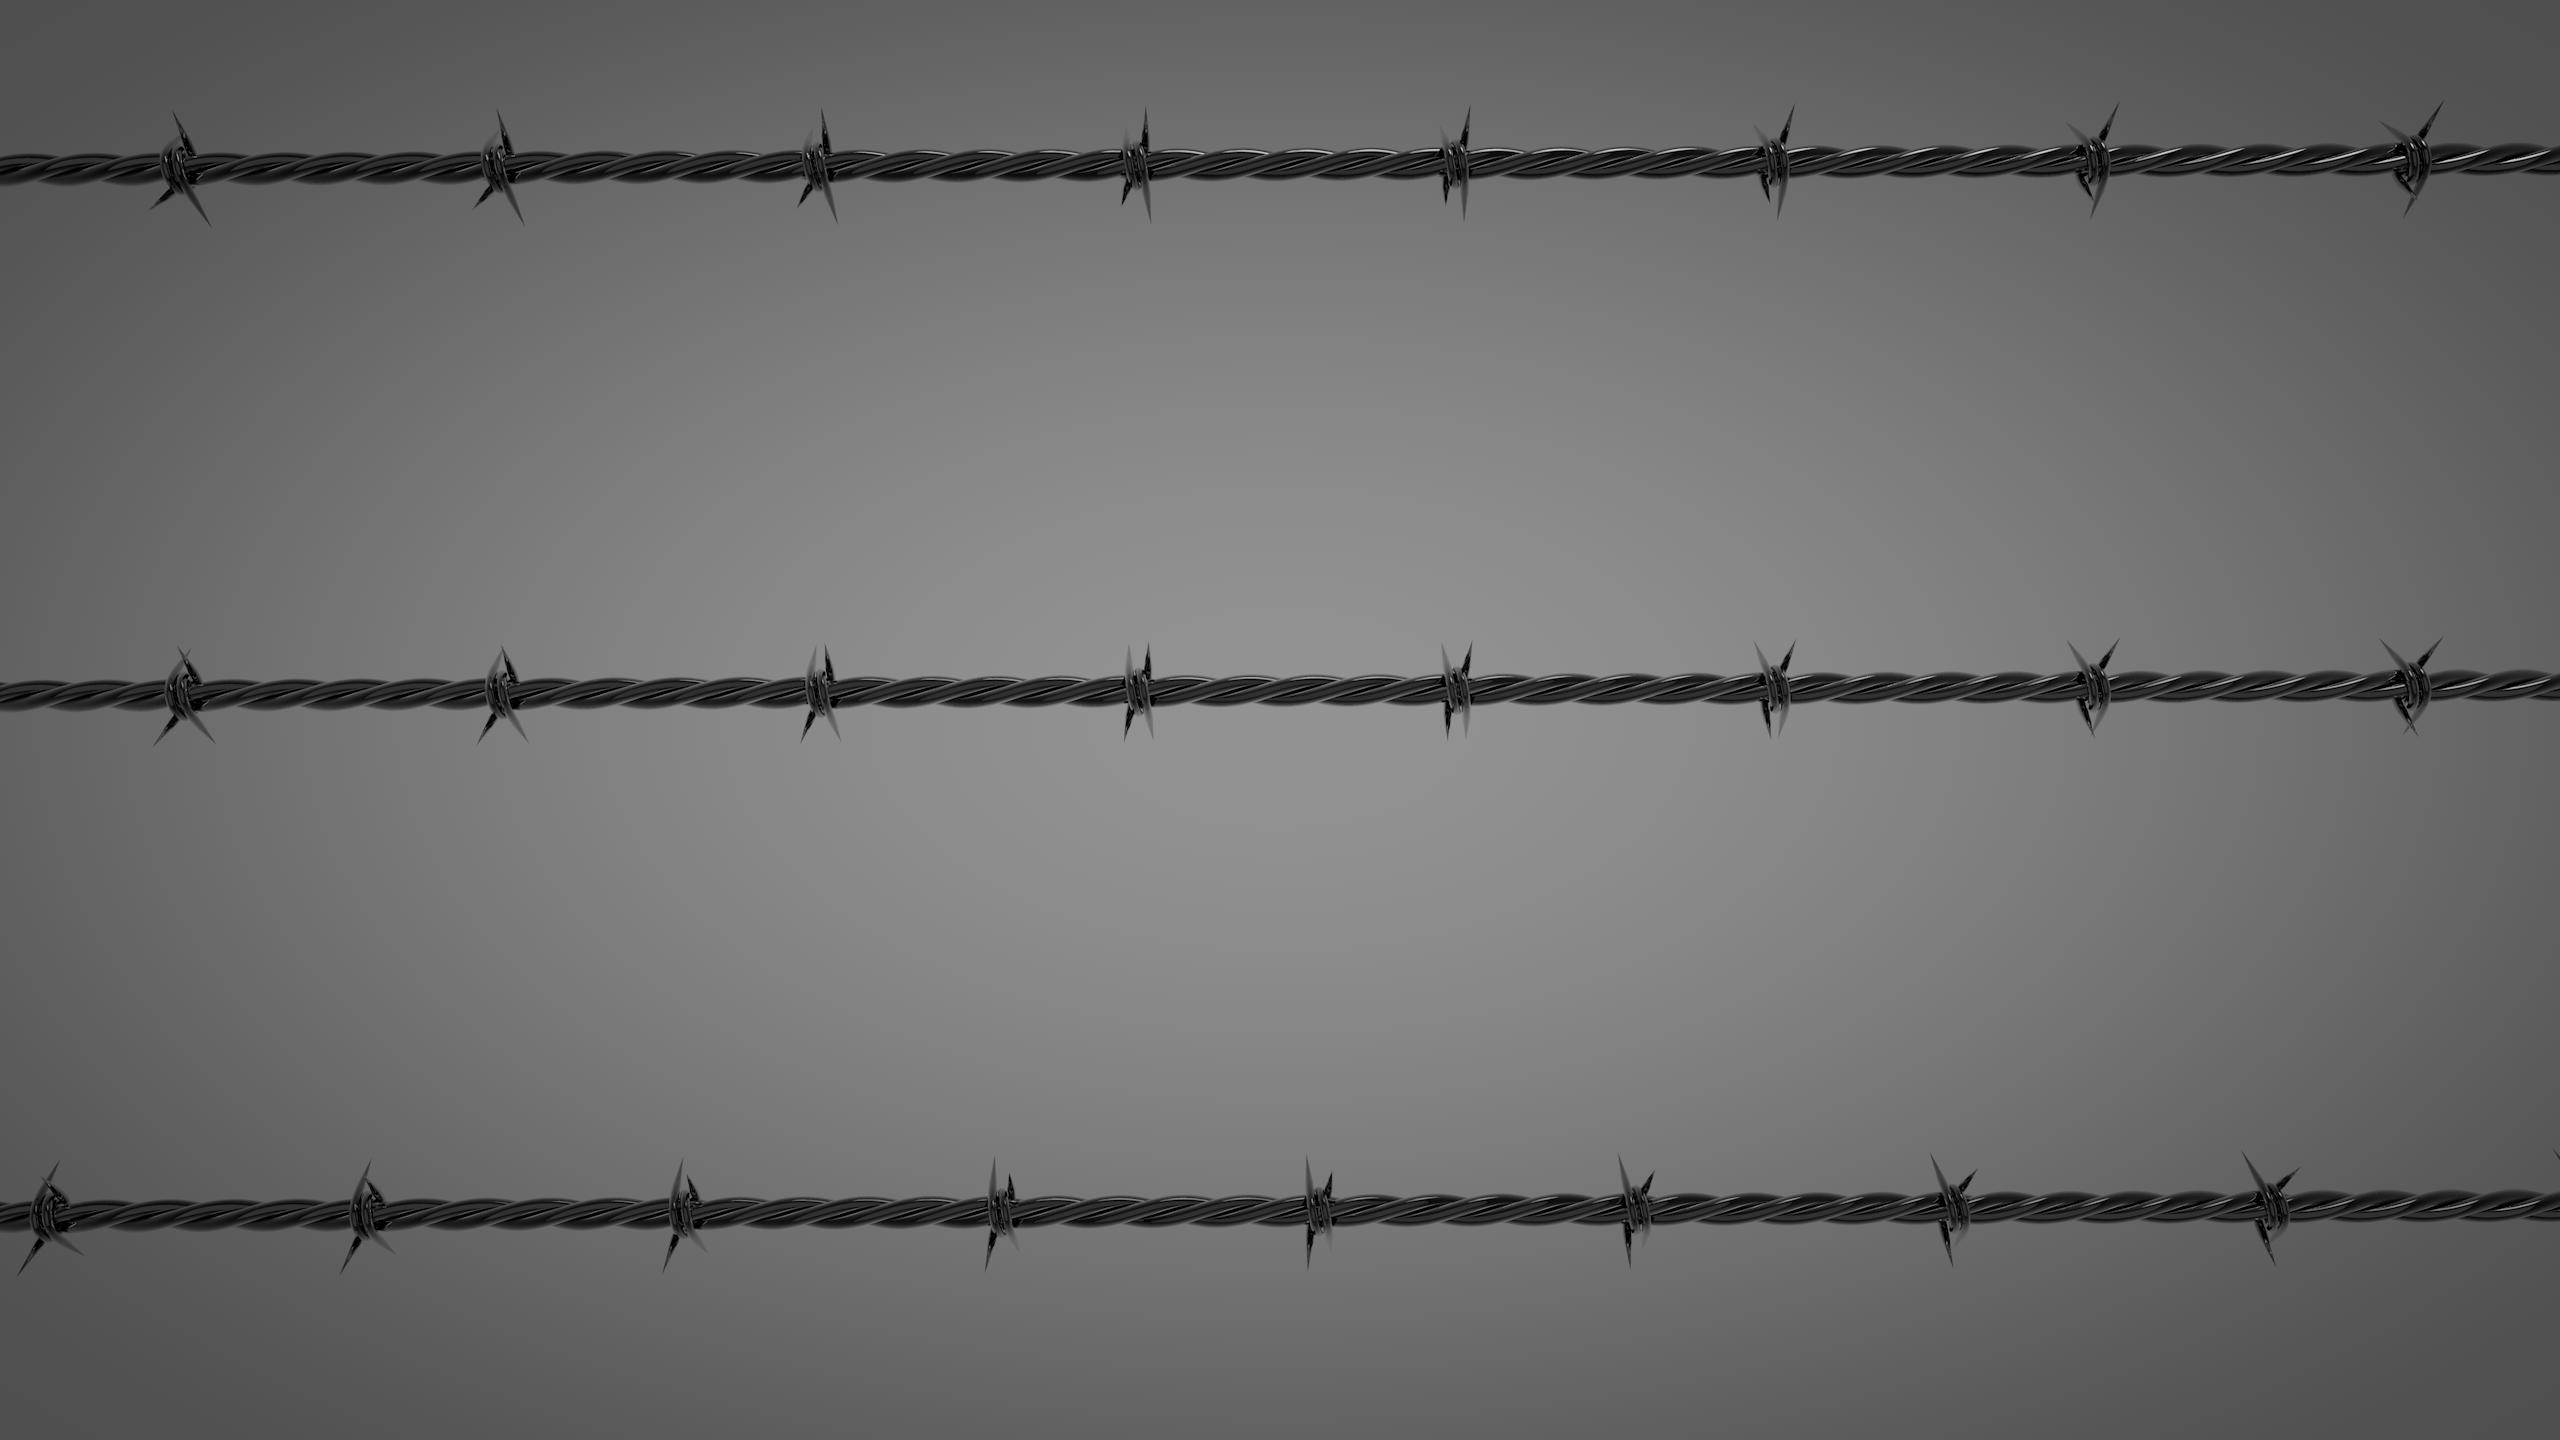 Devils Wire by monkeymagico